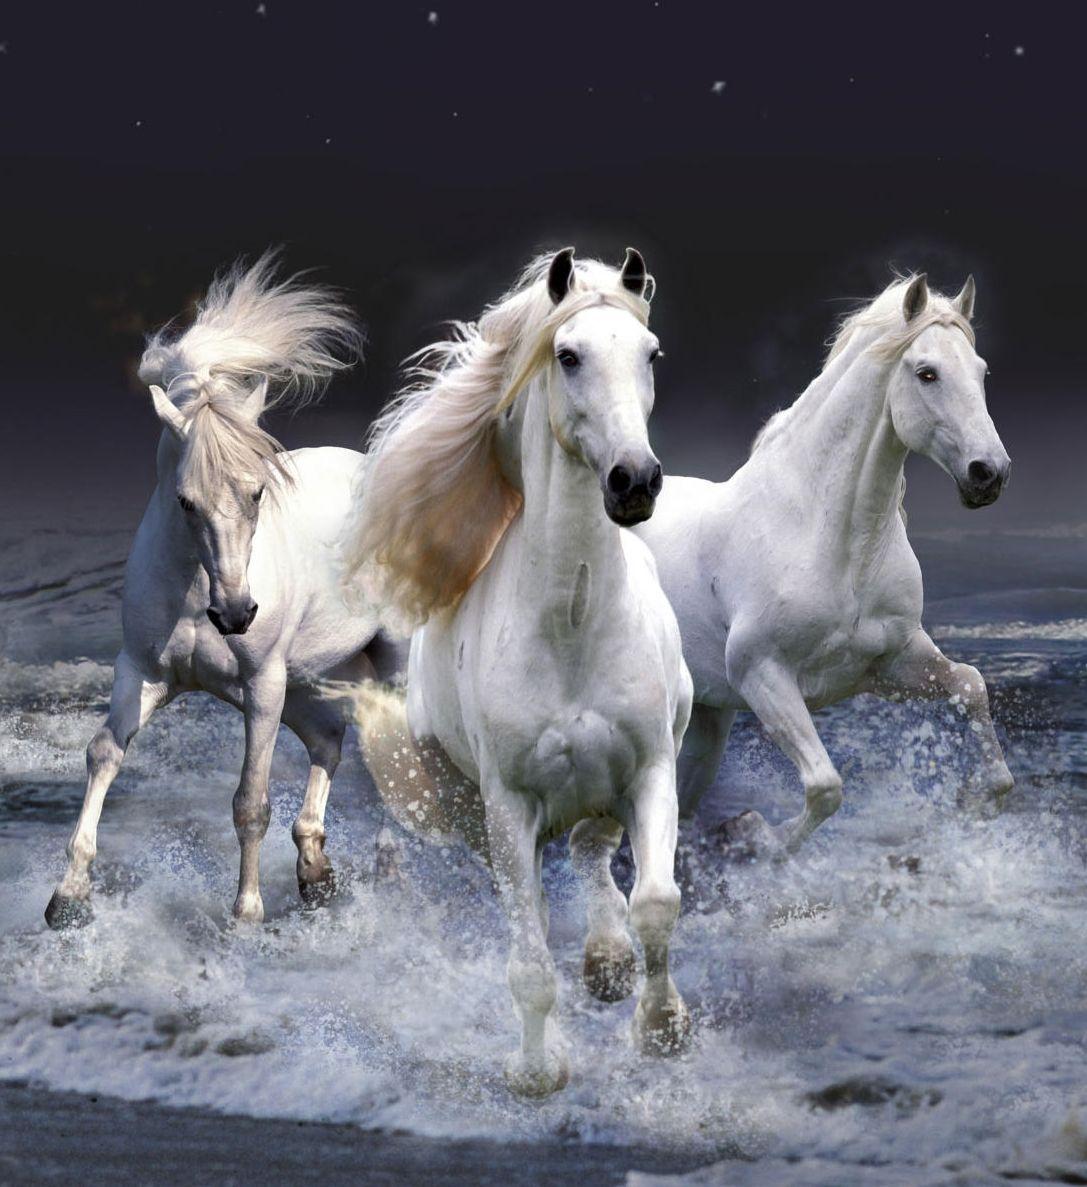 Must see Wallpaper Horse Pinterest - 7670c53ab51cfafe197f05e9ad110b82  2018_883946.jpg